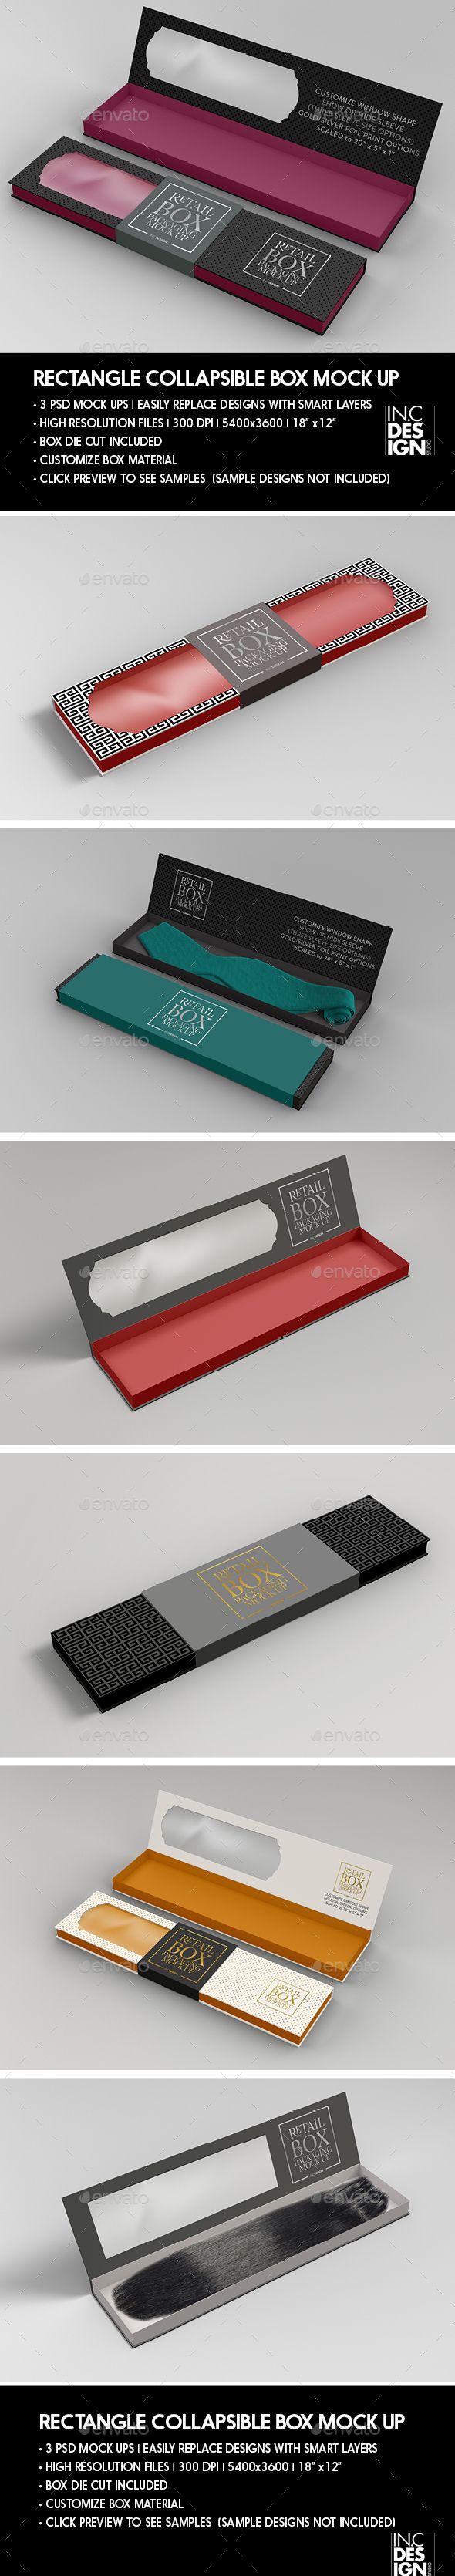 Download Rectangle Collapsible Box Packaging Mockup Professional Fully Editable Box Mockup Design Identity Packaging Mockup Graphic Design Templates Mockup Design